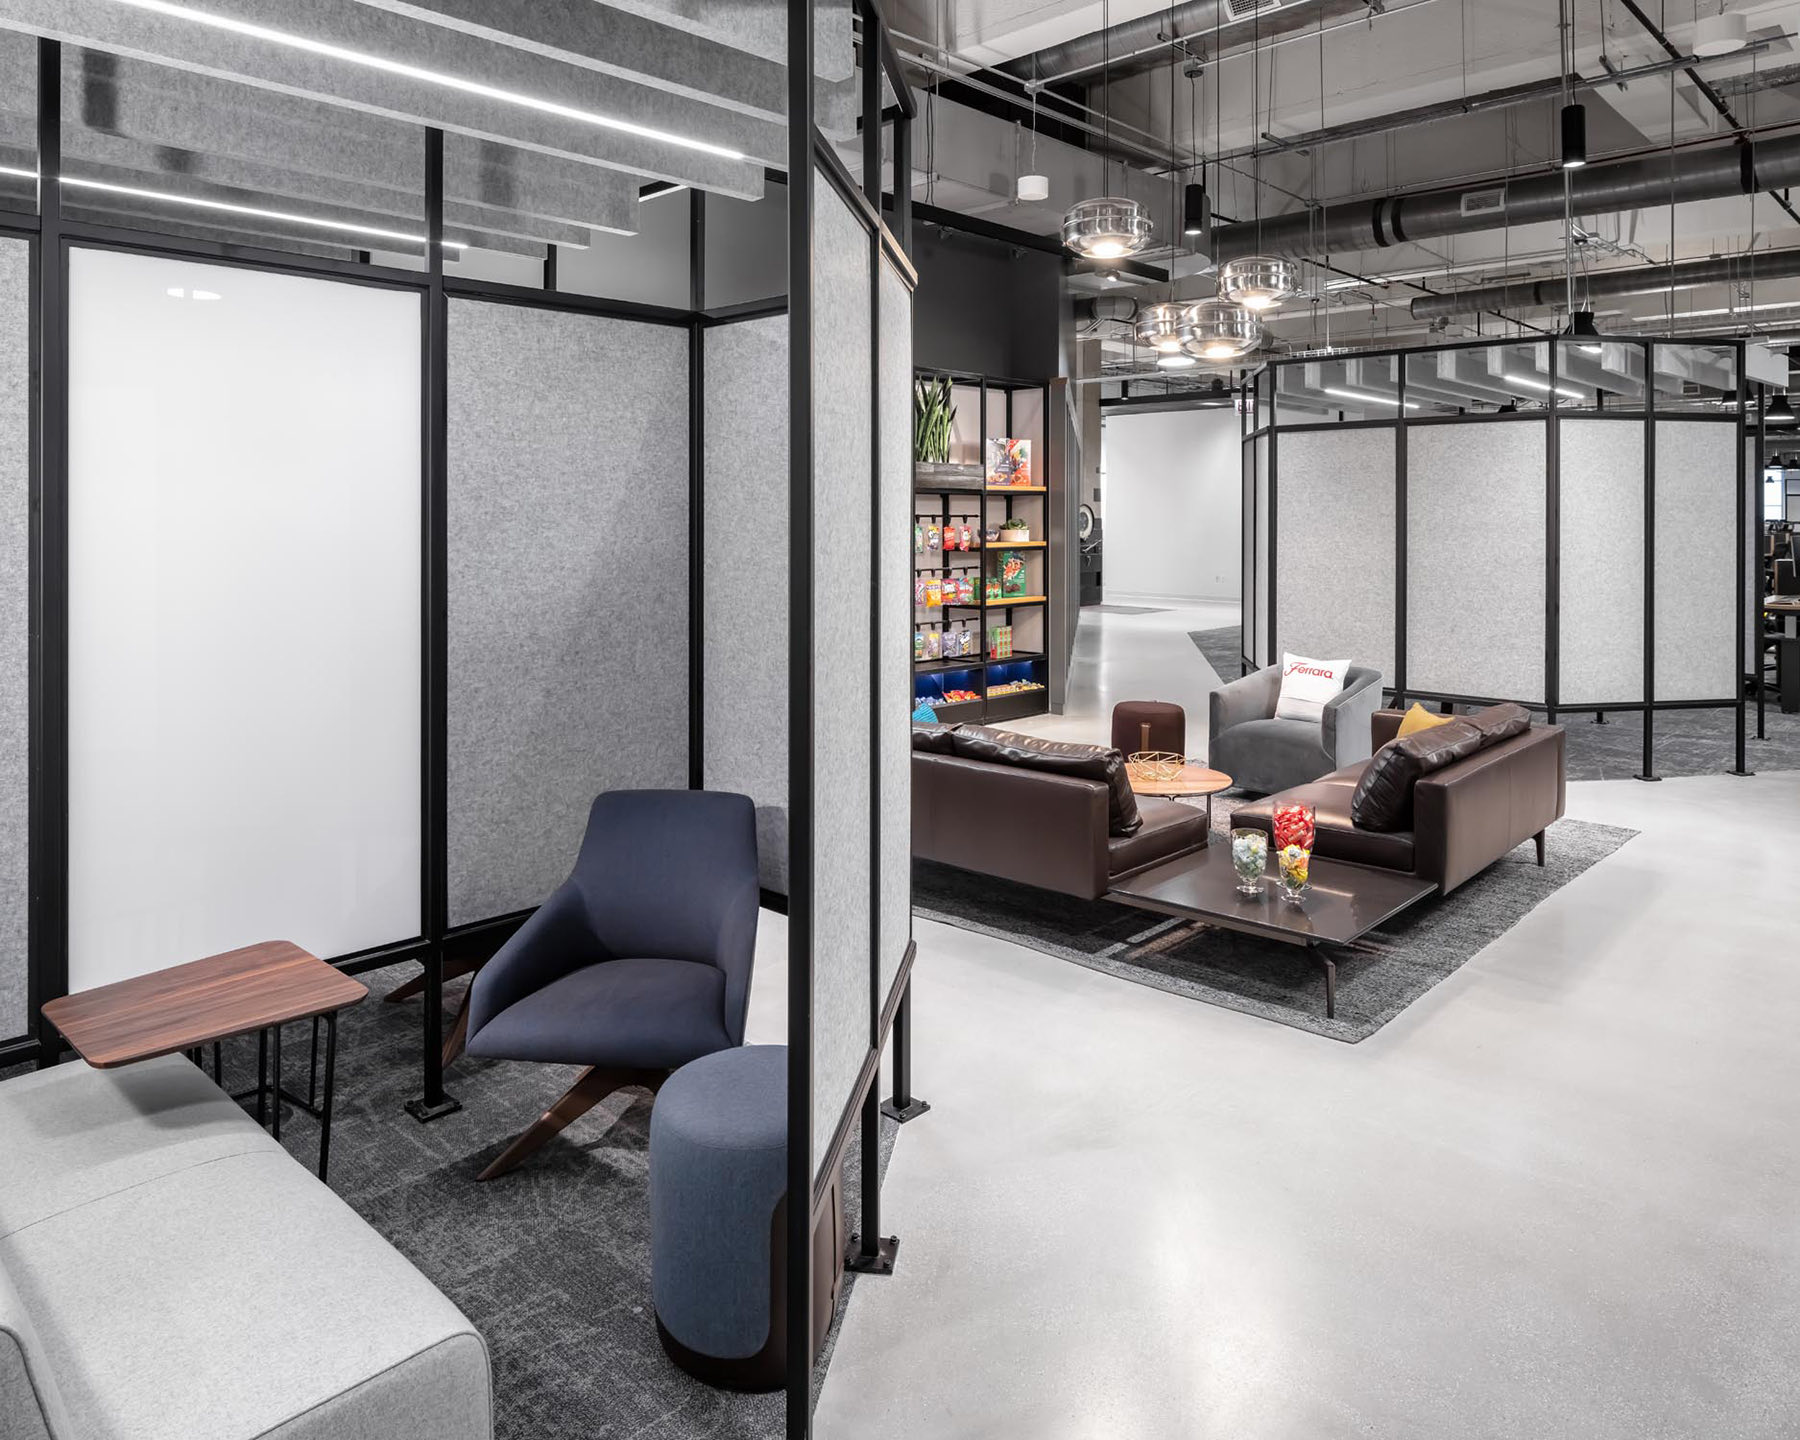 ferrara-candy-chicago-office-11